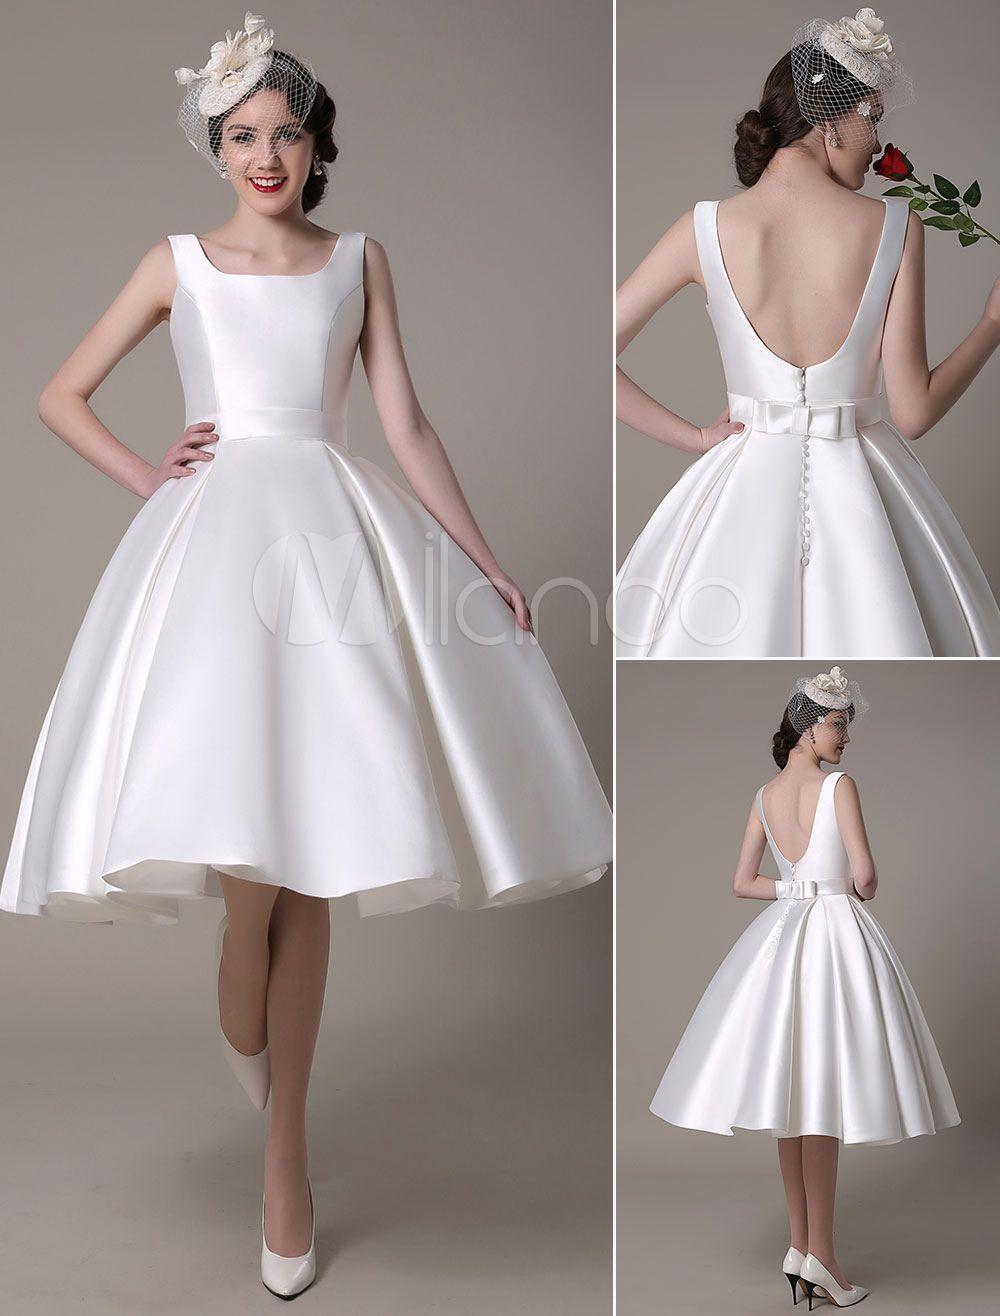 Ivory wedding dress scoop backless knee length satin wedding gown